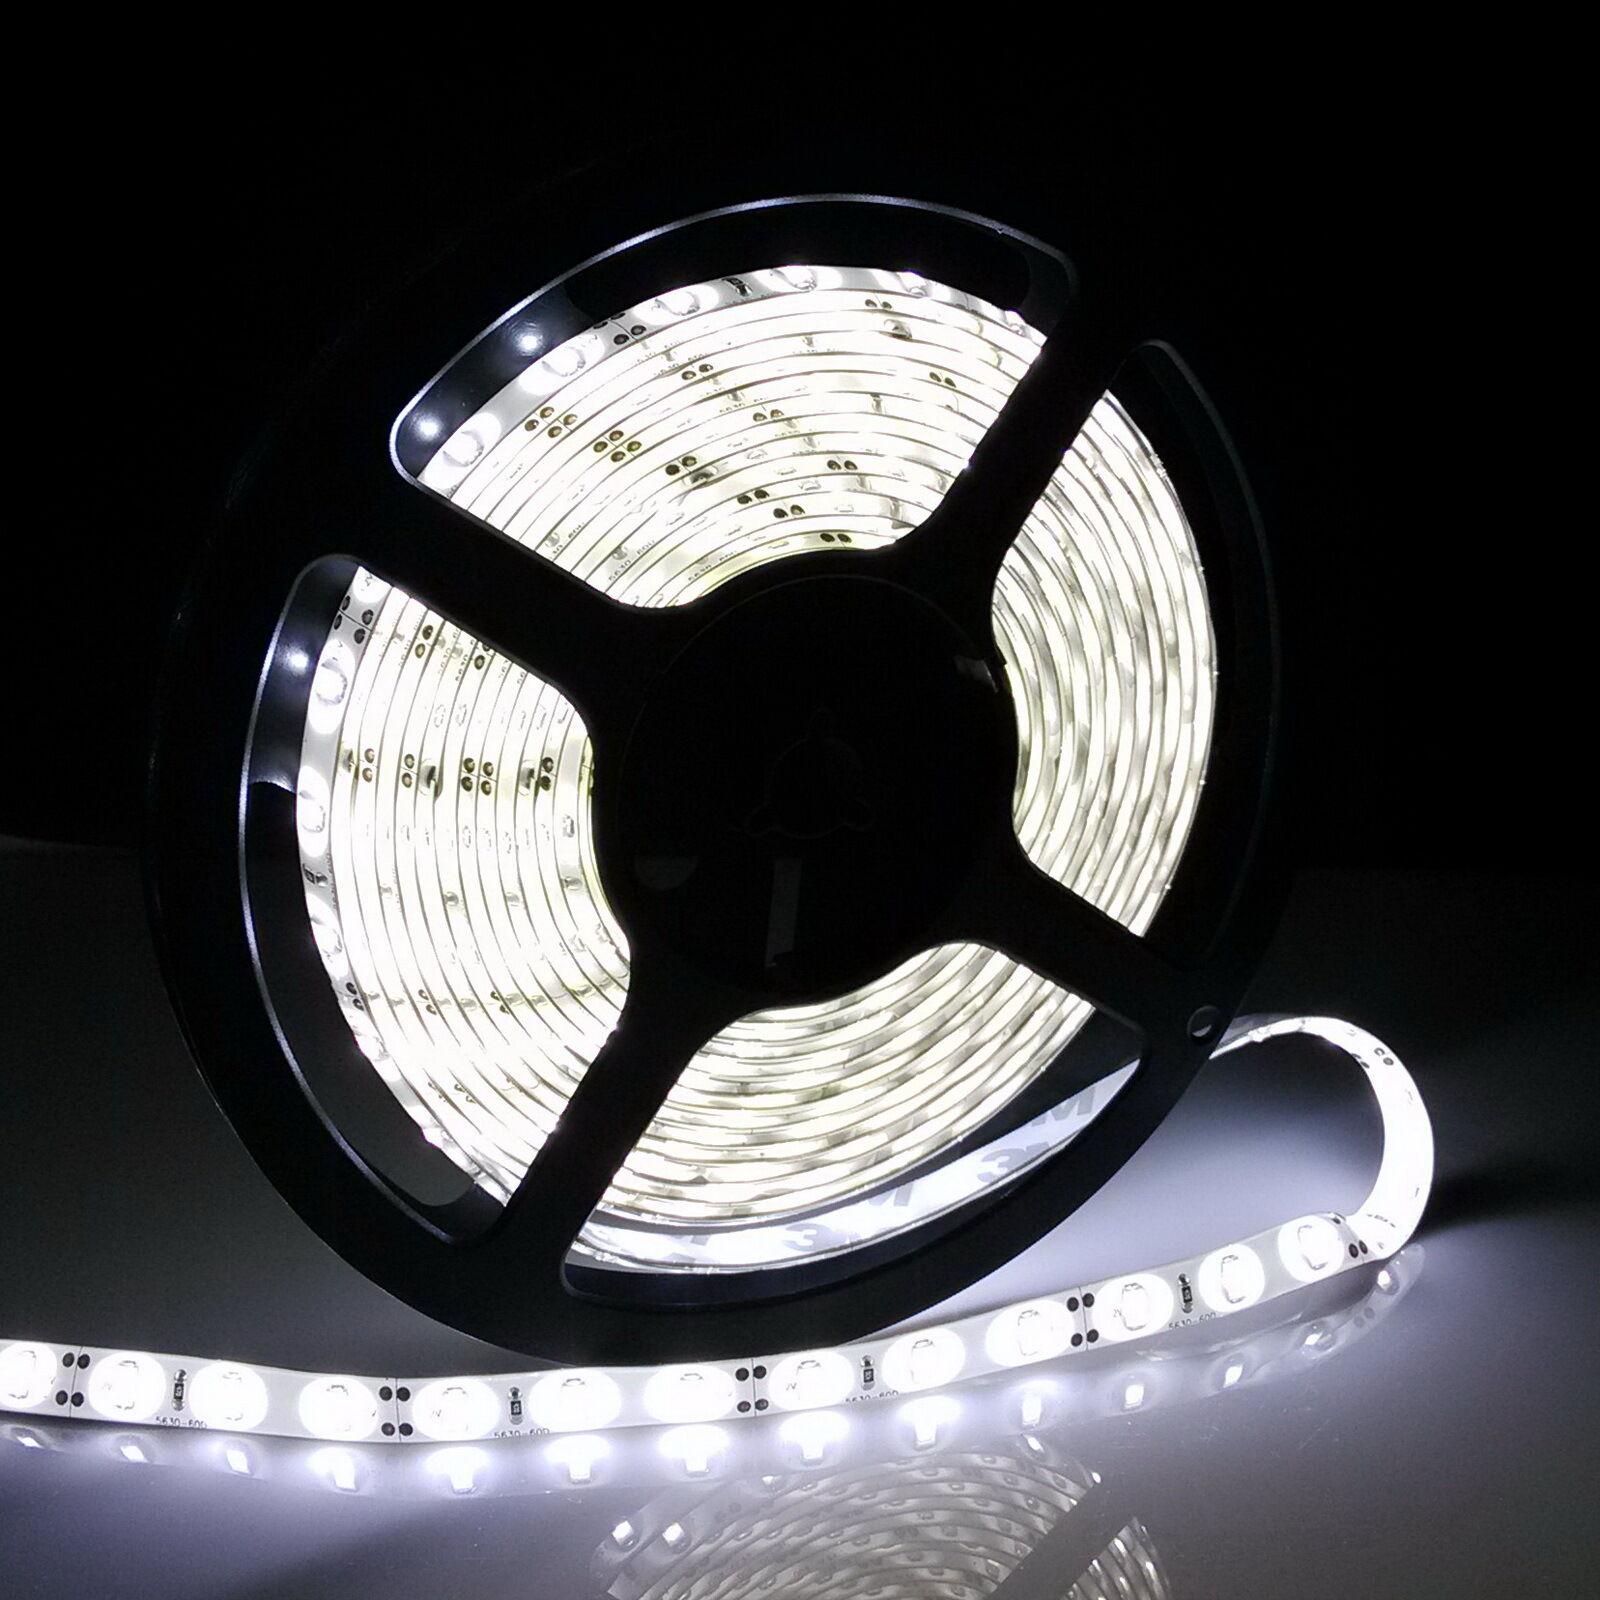 5m-20m 12V 24V SMD 5050 LED Stripe Streifen Band Leiste Licht Kaltweiß Netzteil